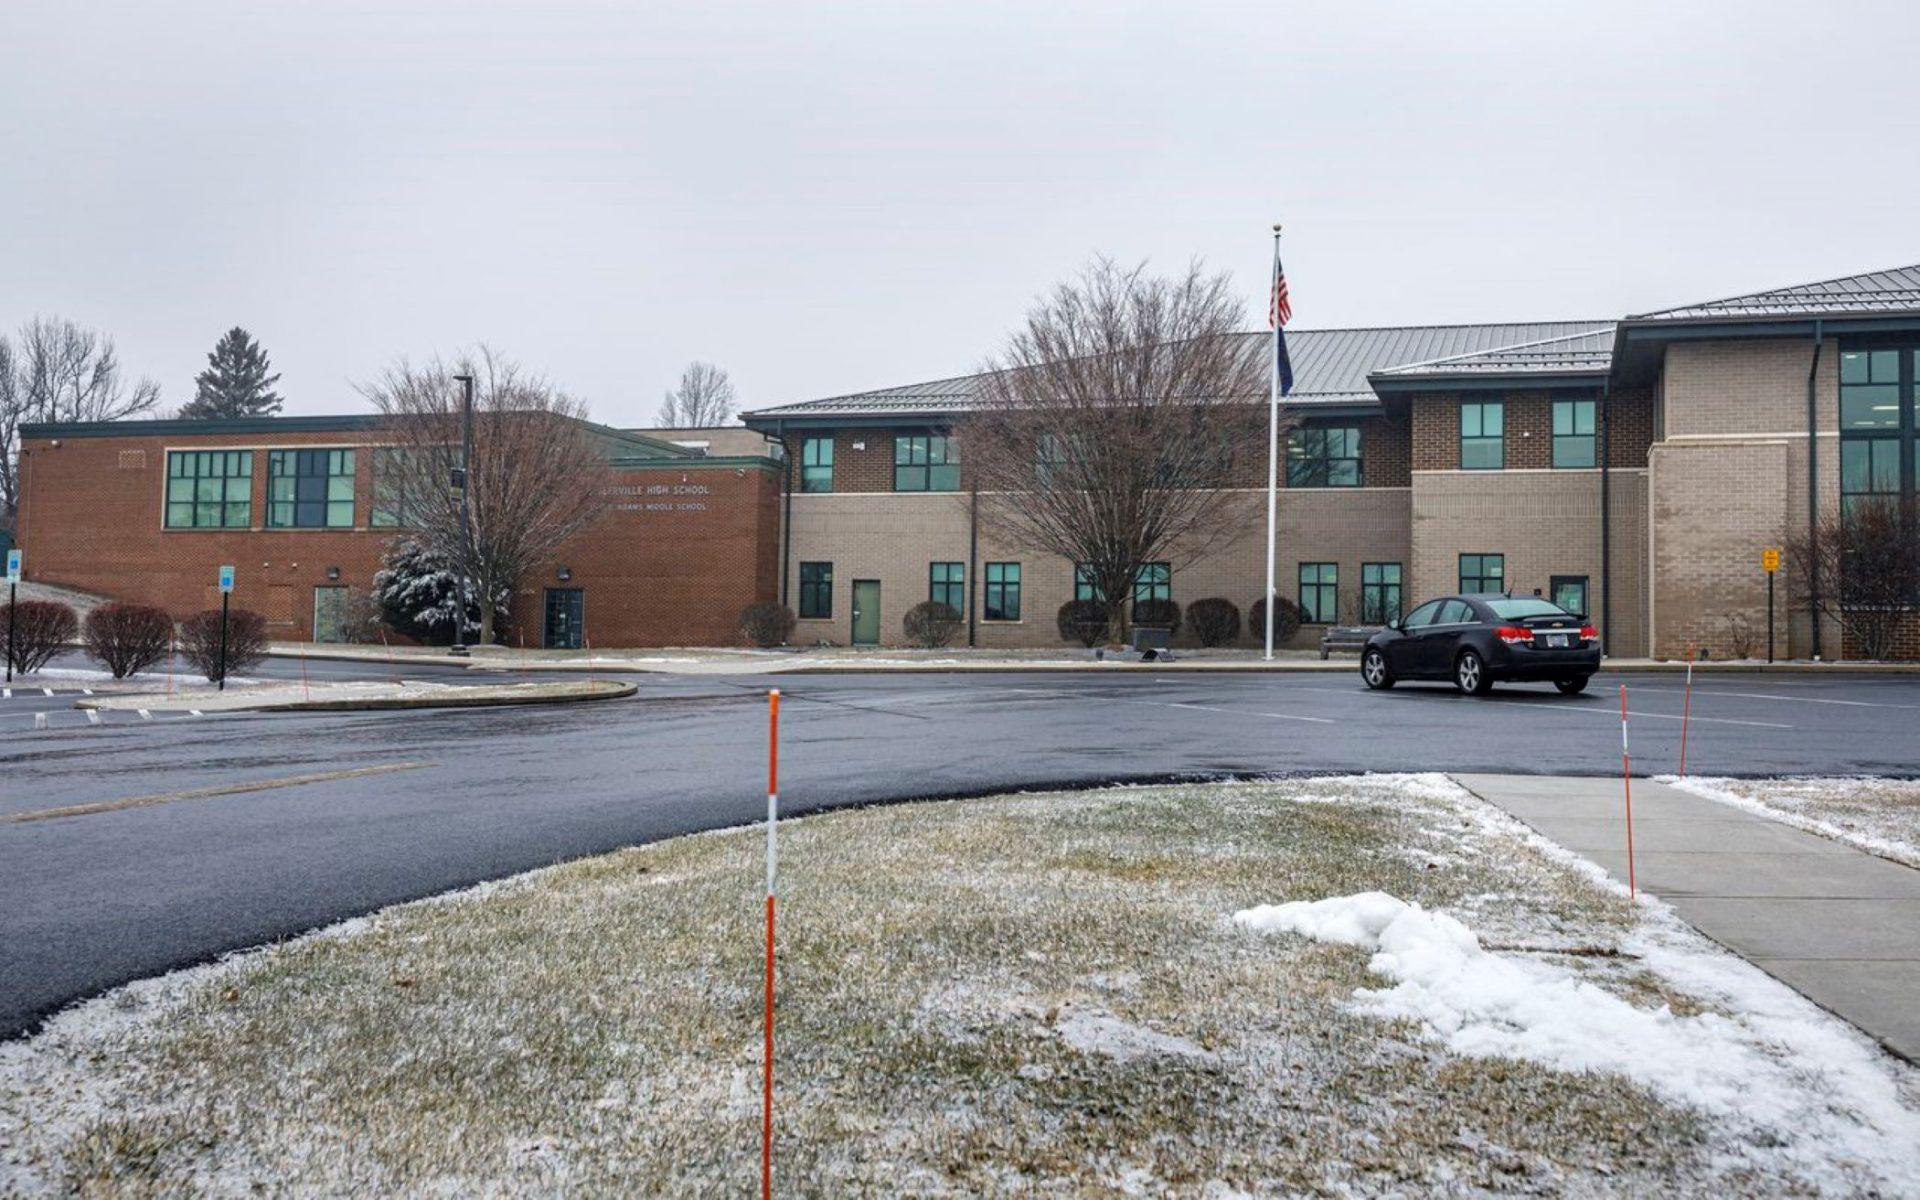 Biglerville High School and Upper Adams Middle School, in Adams County. January 26, 2021.